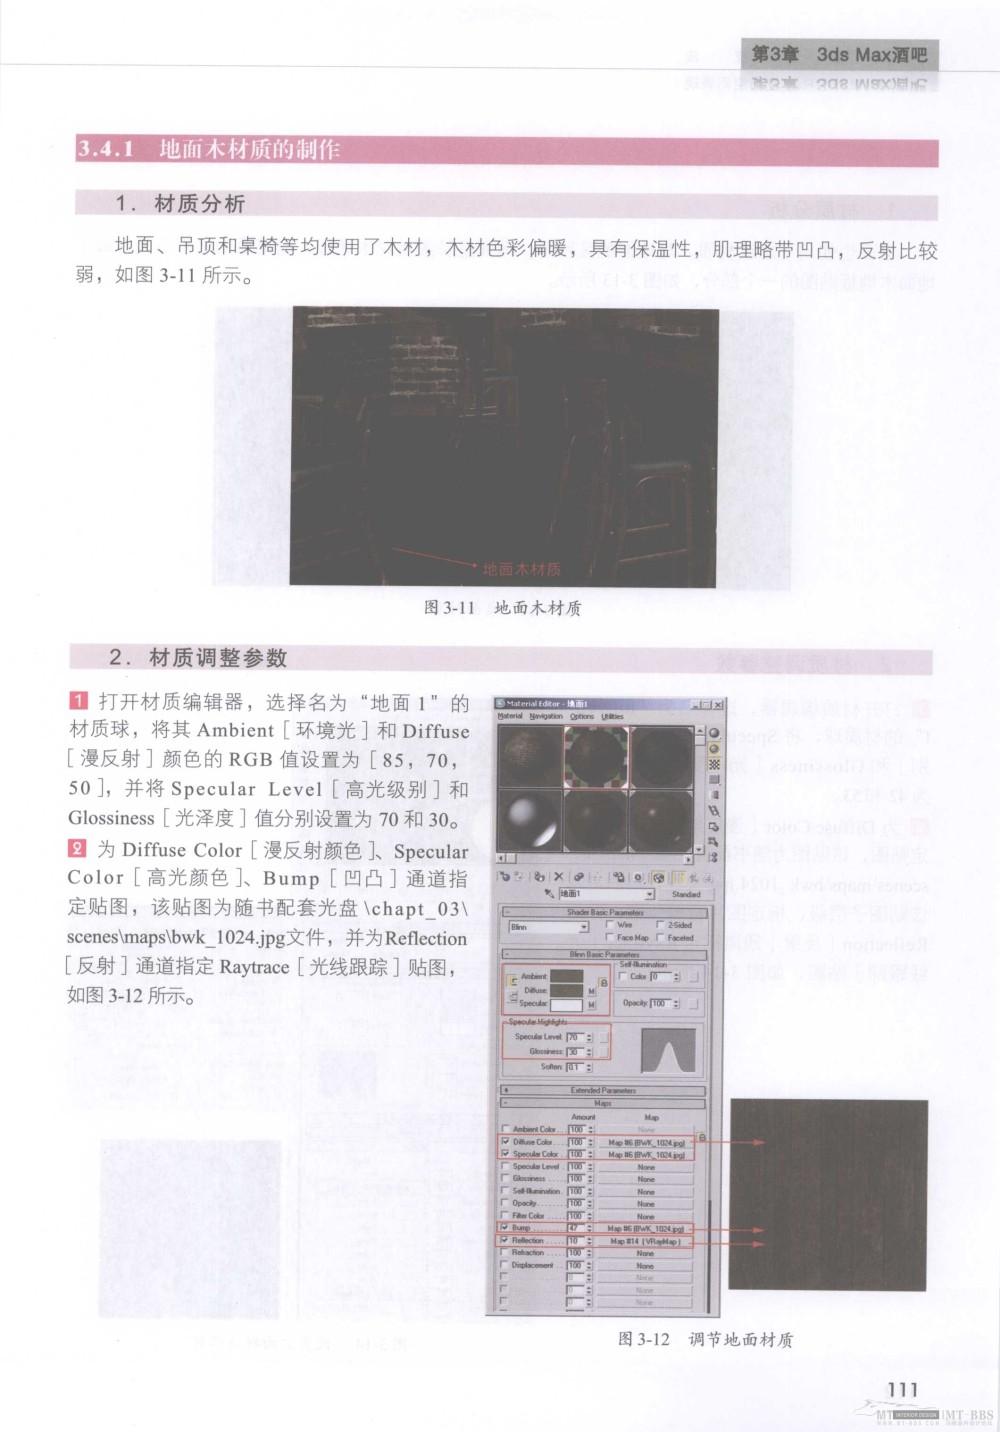 水晶石技法-3ds_Max&VRay室内空间表现_水晶石技法-3ds_Max&VRay室内空间表现_页面_117.jpg